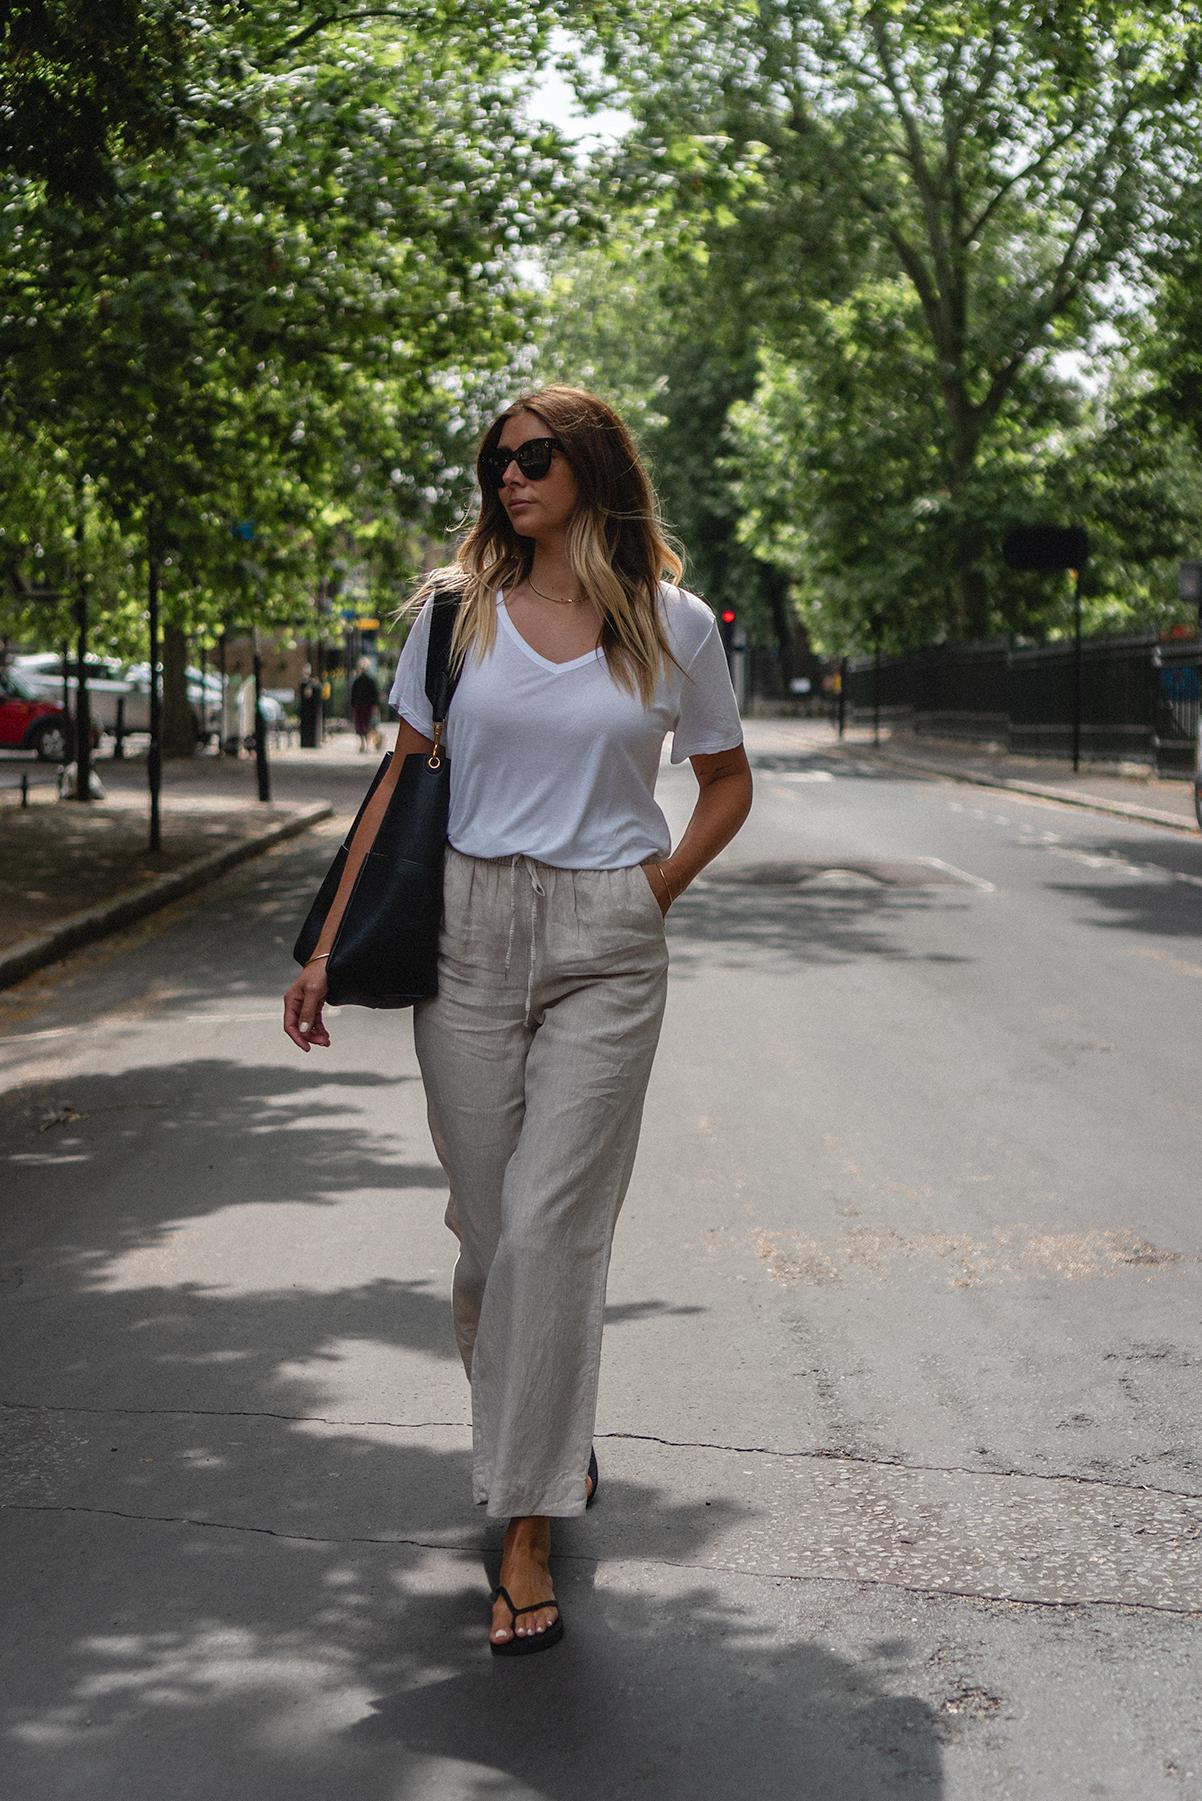 Emma Hill wears white v neck t-shirt, beige linen trousers, Sleepers black flip flops, Celine Seau Sangle bag in black. Casual Summer outfit